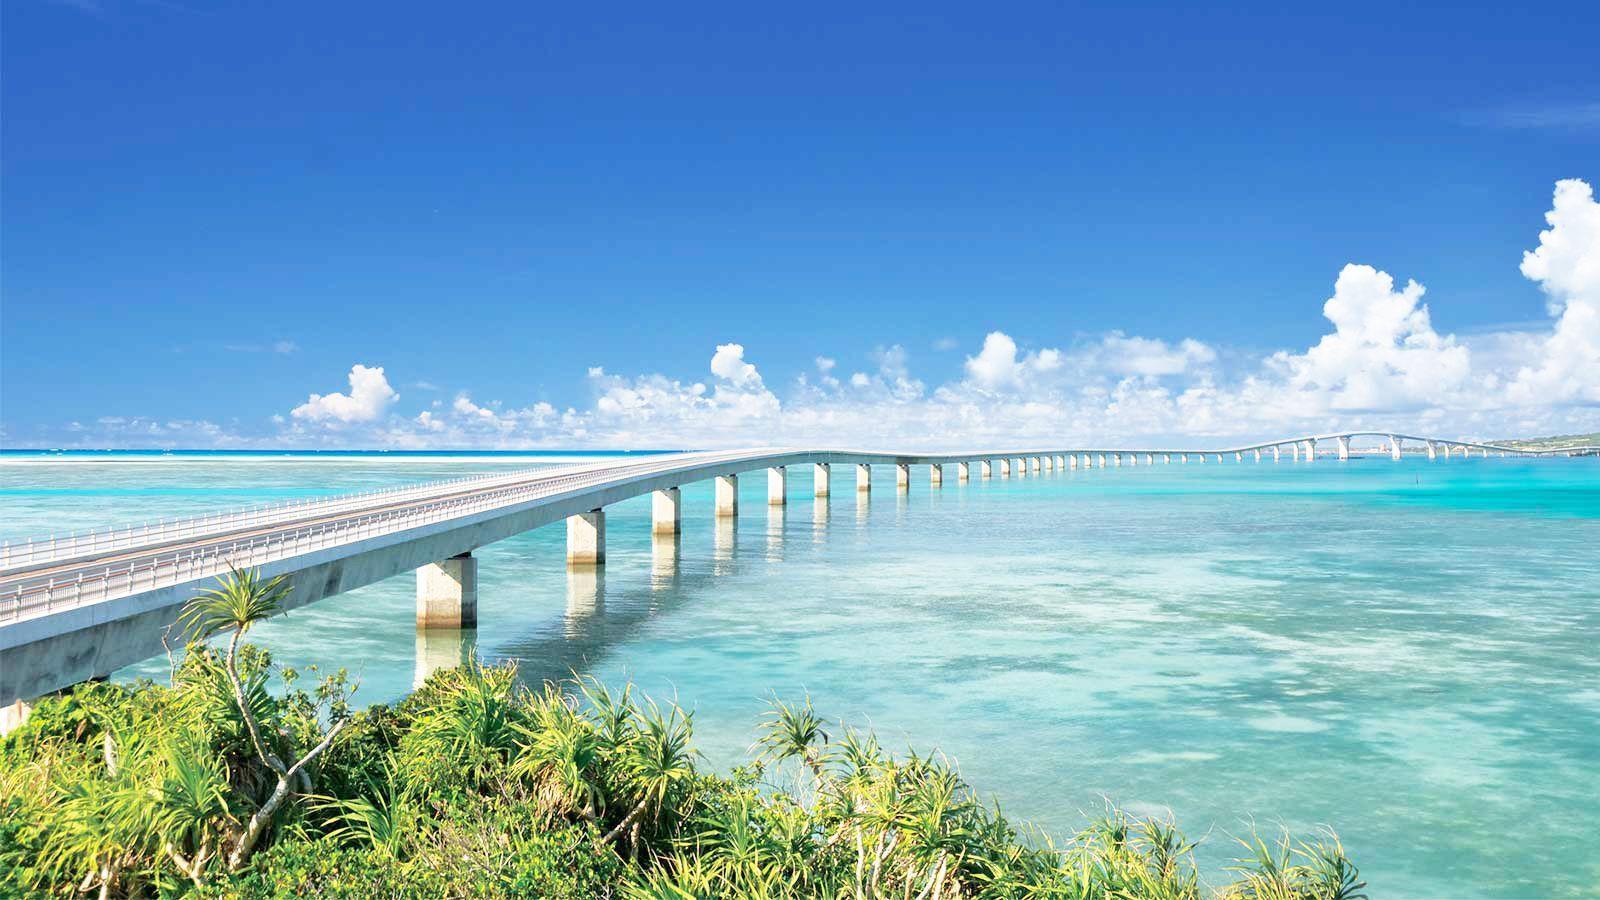 Miyako Island Okinawa Prefecture 沖縄県 宮古島 伊良部大橋 1600